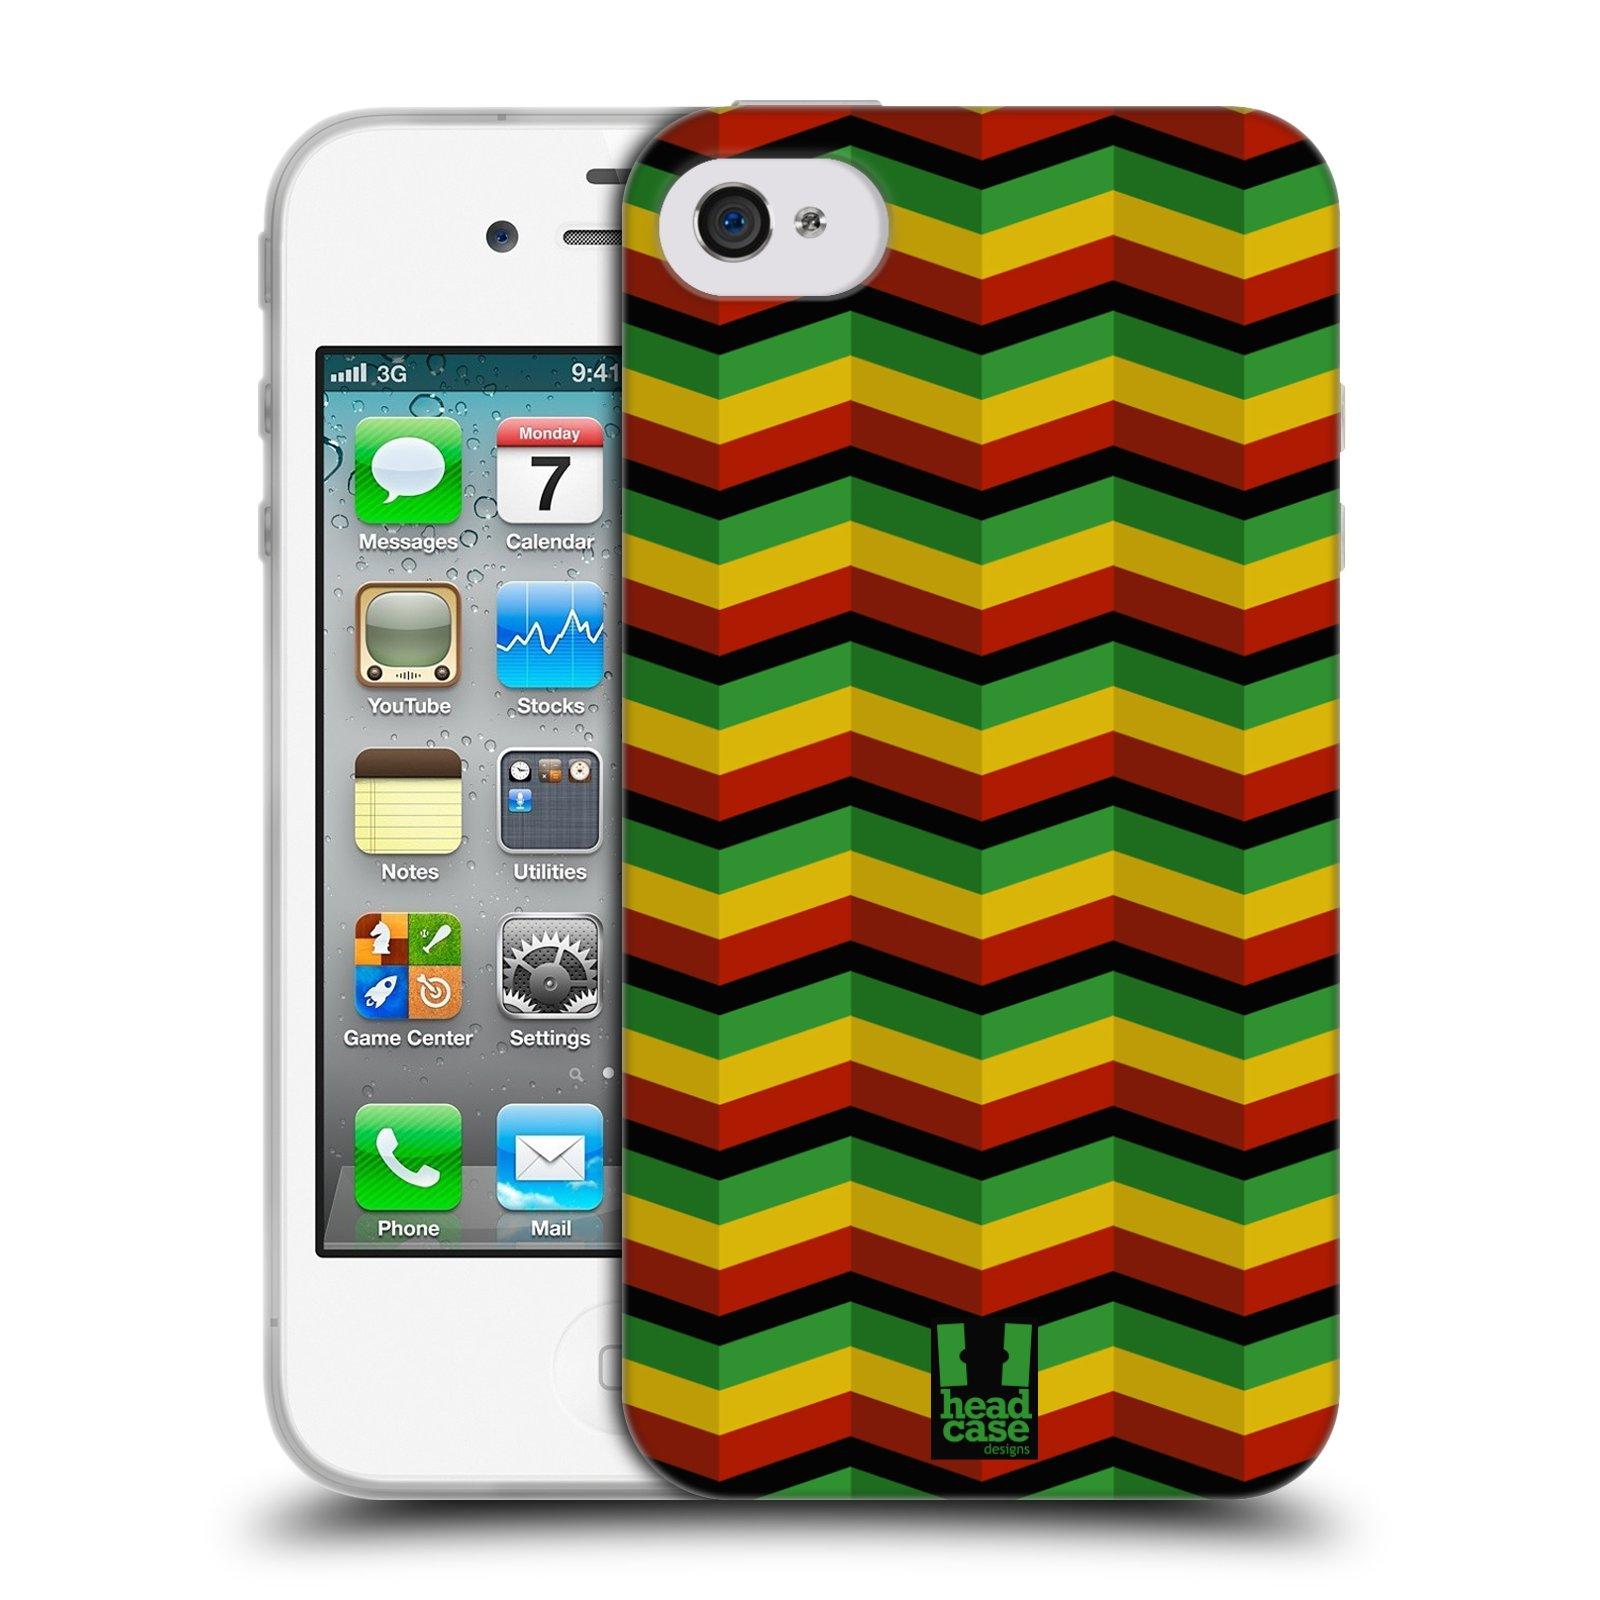 HEAD CASE silikonový obal na mobil Apple Iphone 4/4S vzor Rasta barevné vzory CHEVRON